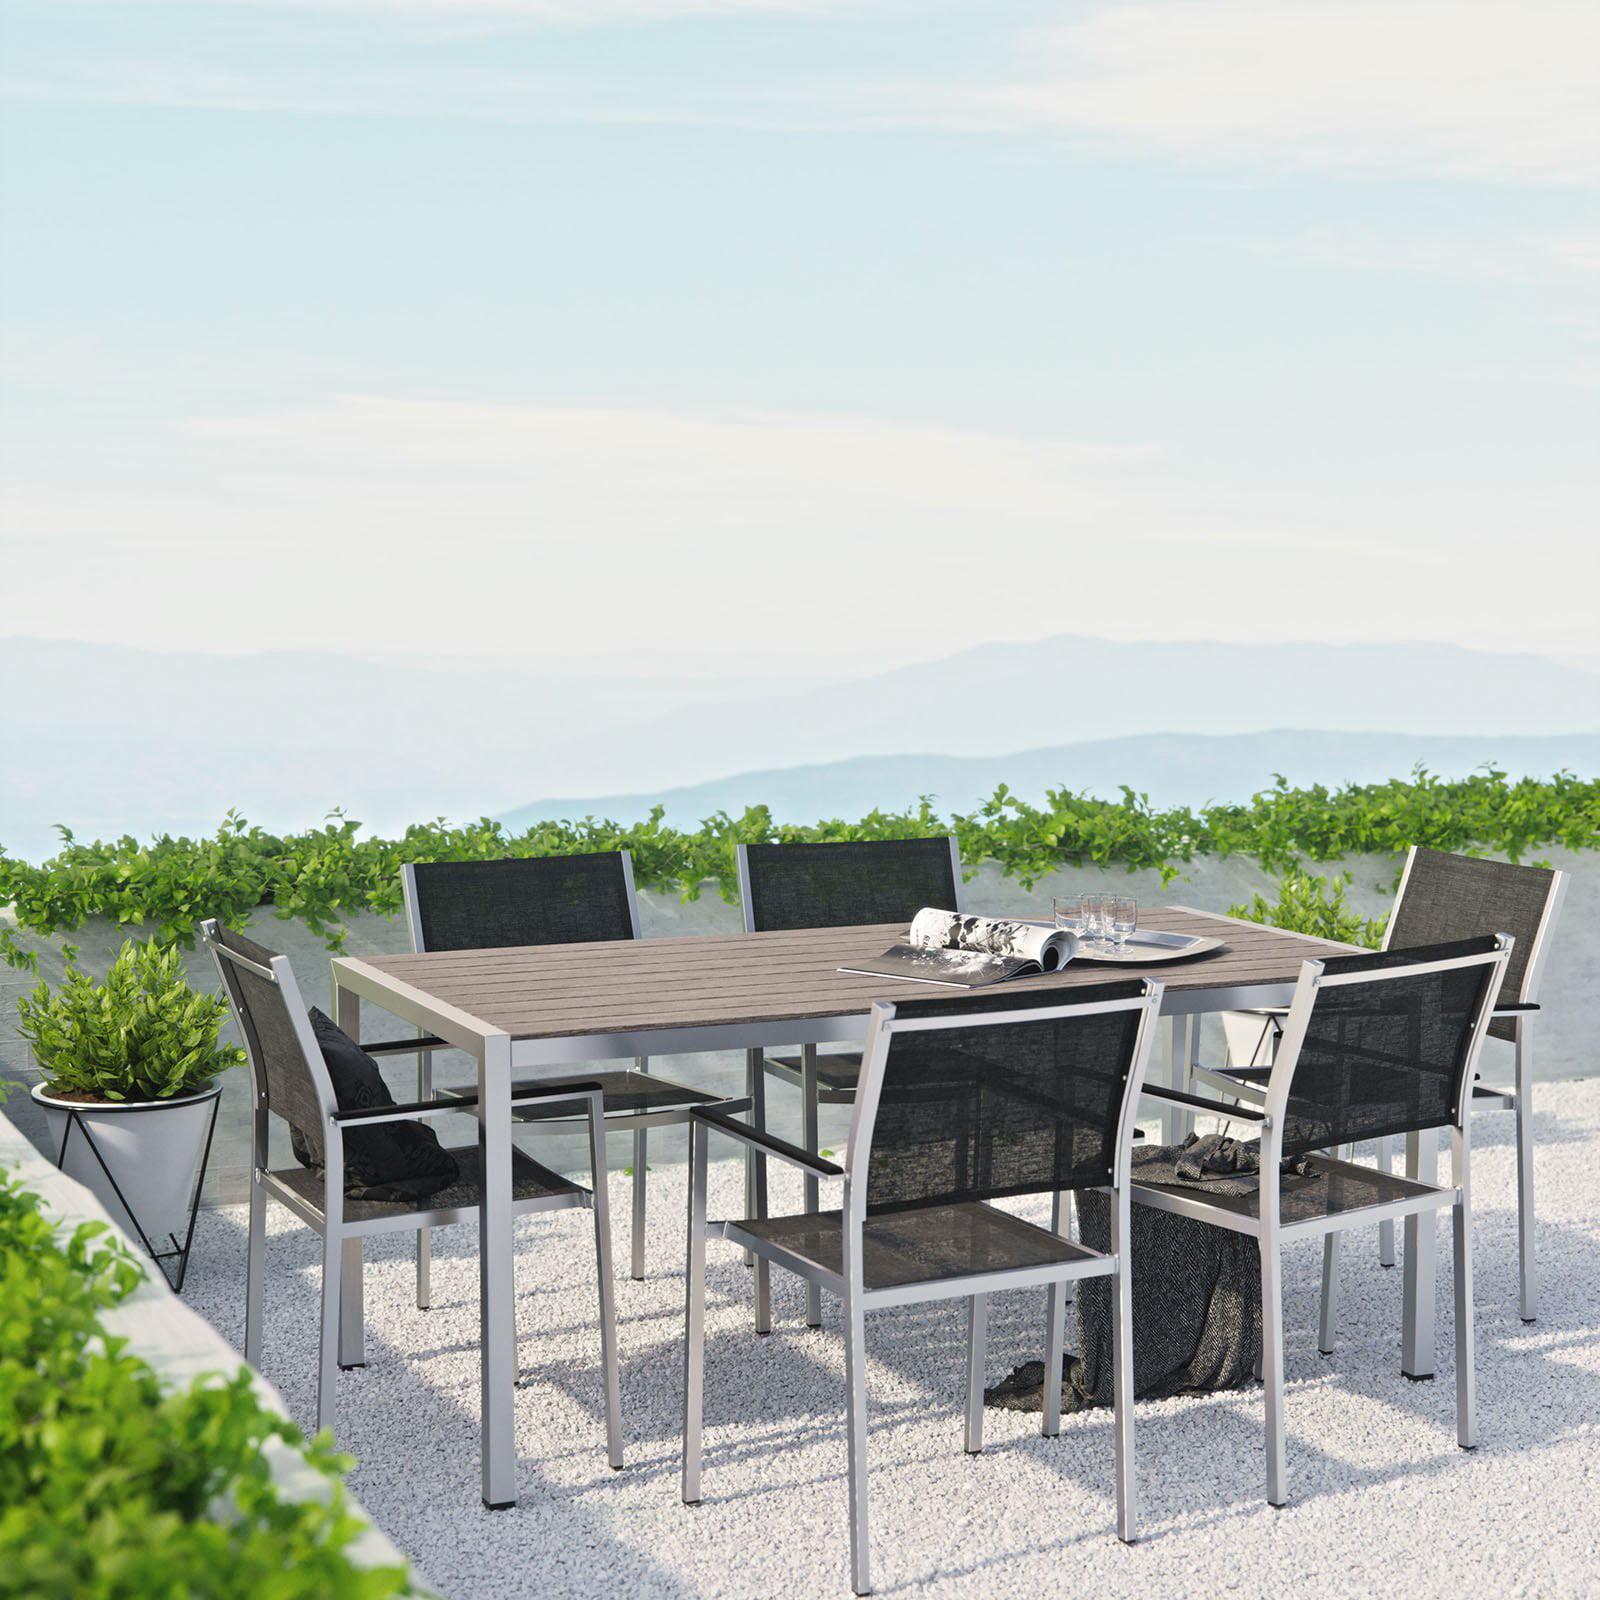 Modway Shore 7 Piece Outdoor Patio Aluminum Dining Set in Silver Black